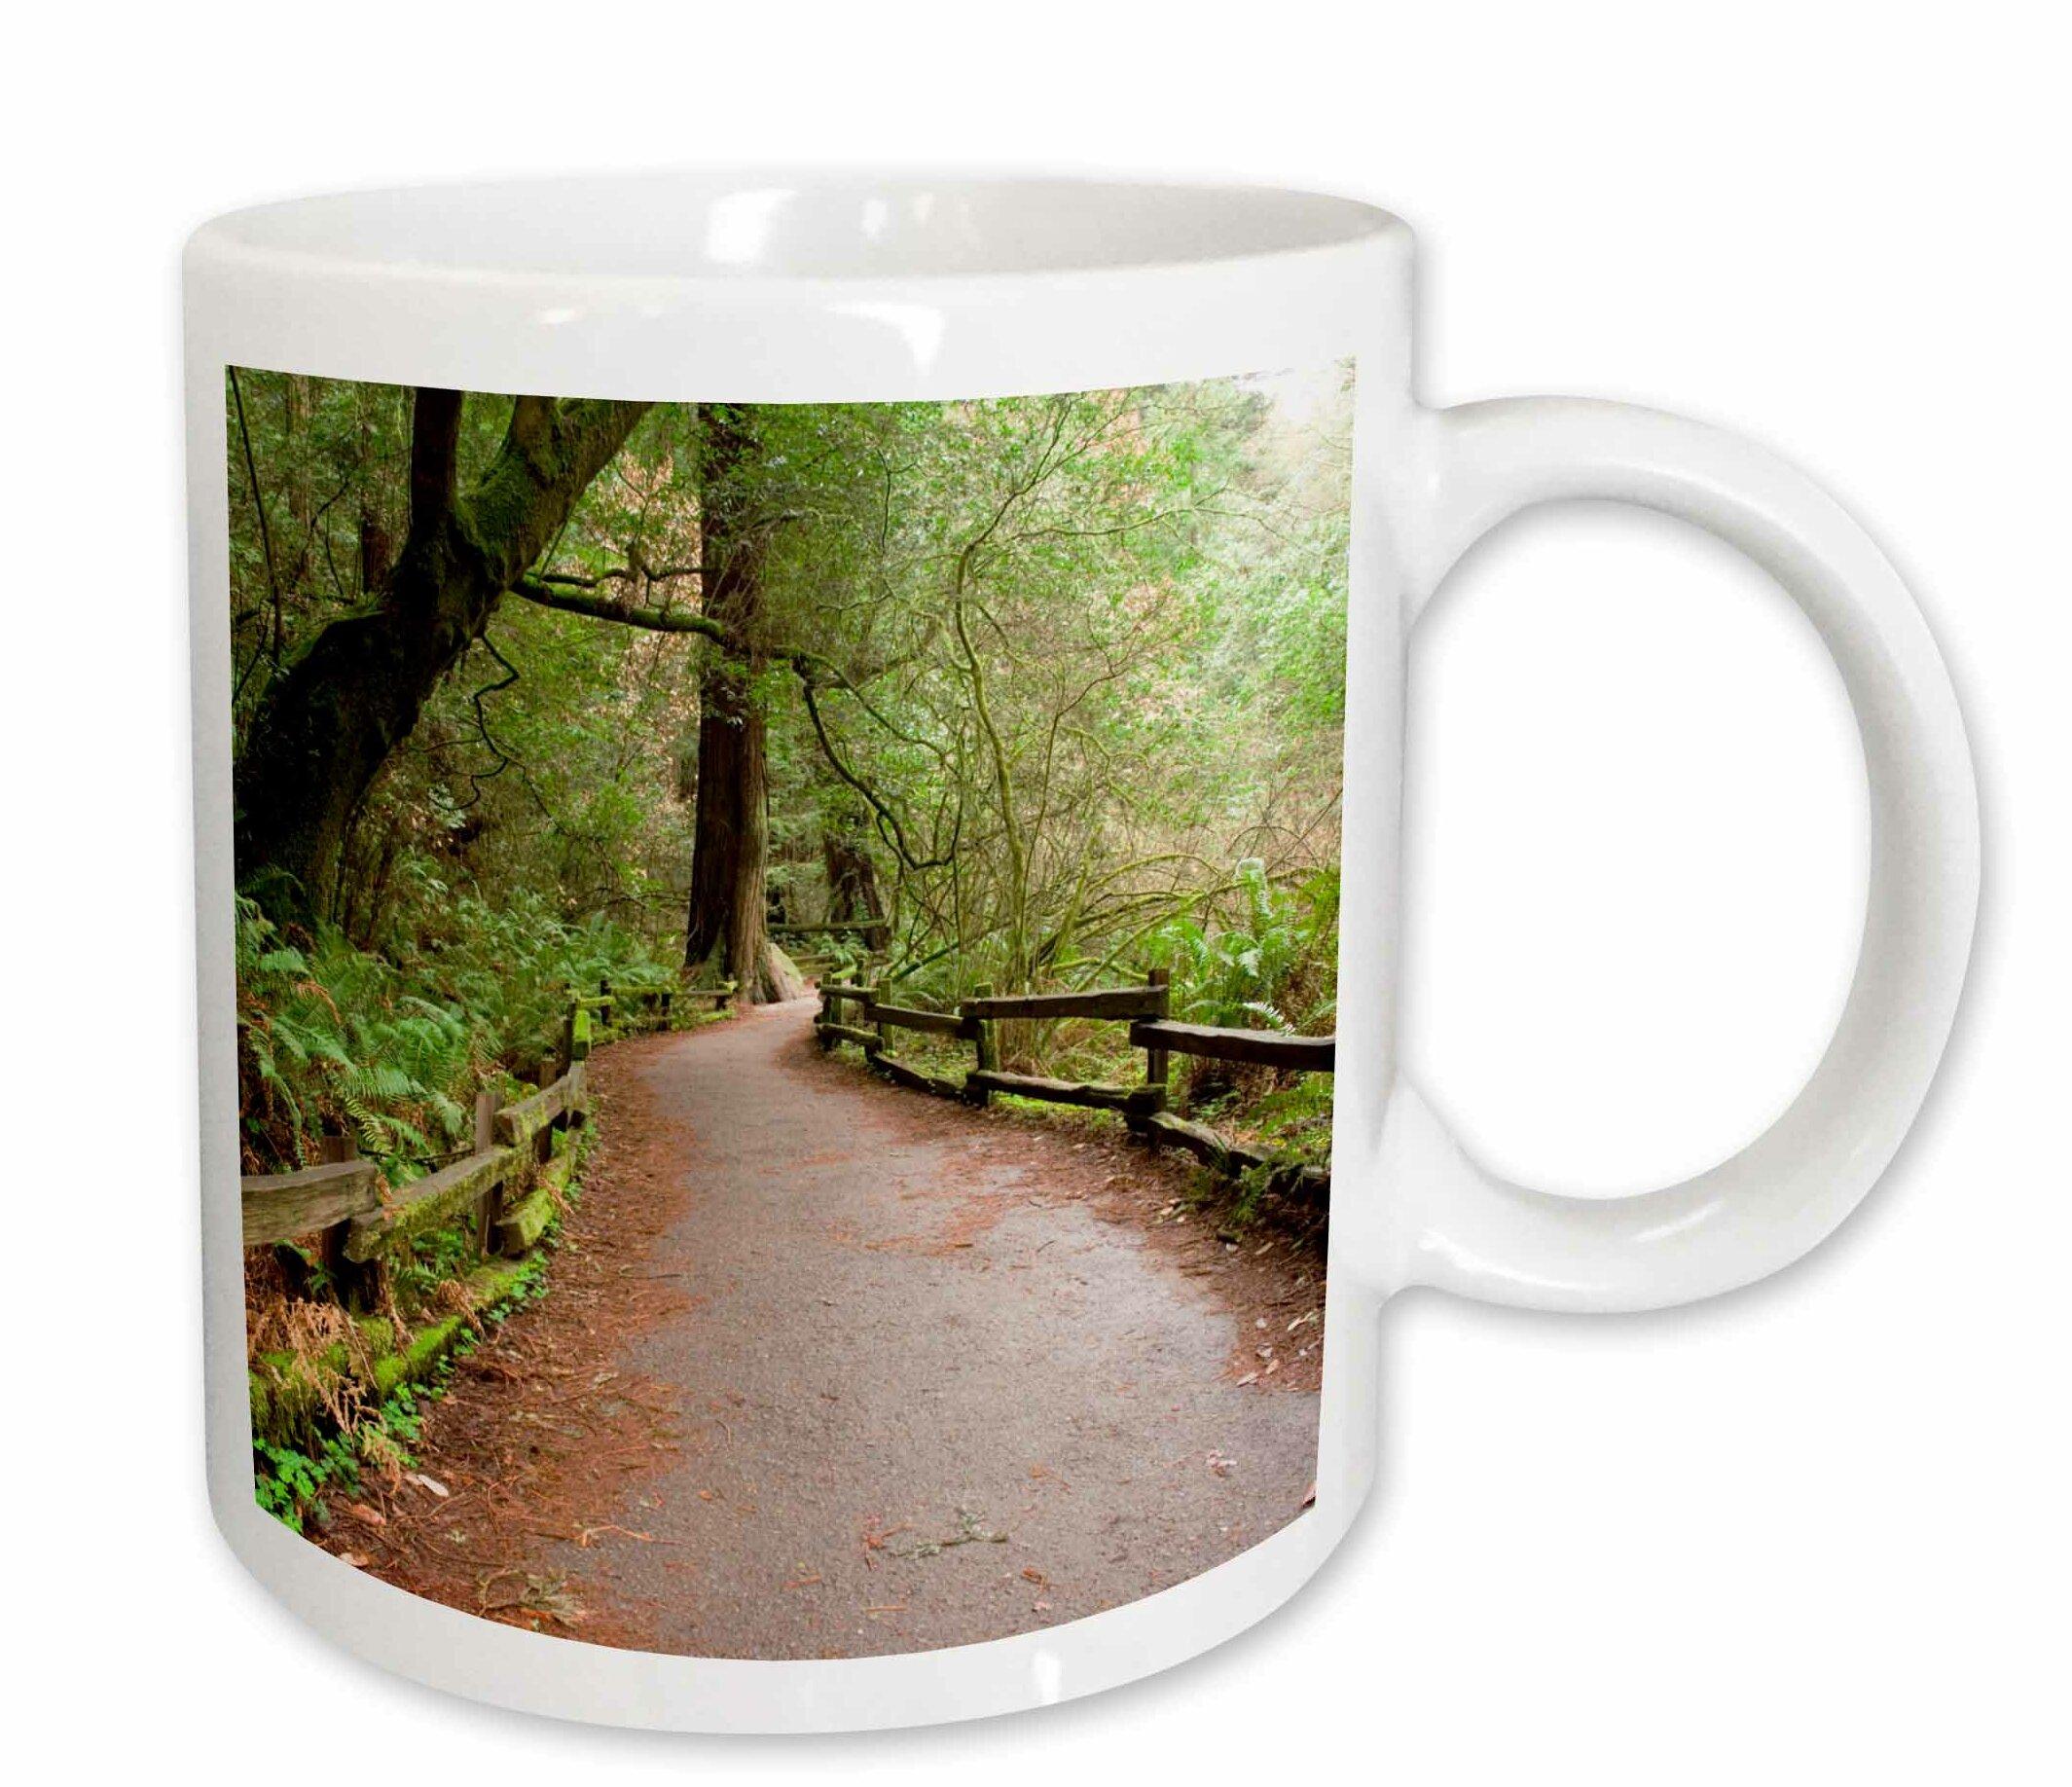 East Urban Home California Marin County Muir Woods Nm Path Coffee Mug Wayfair